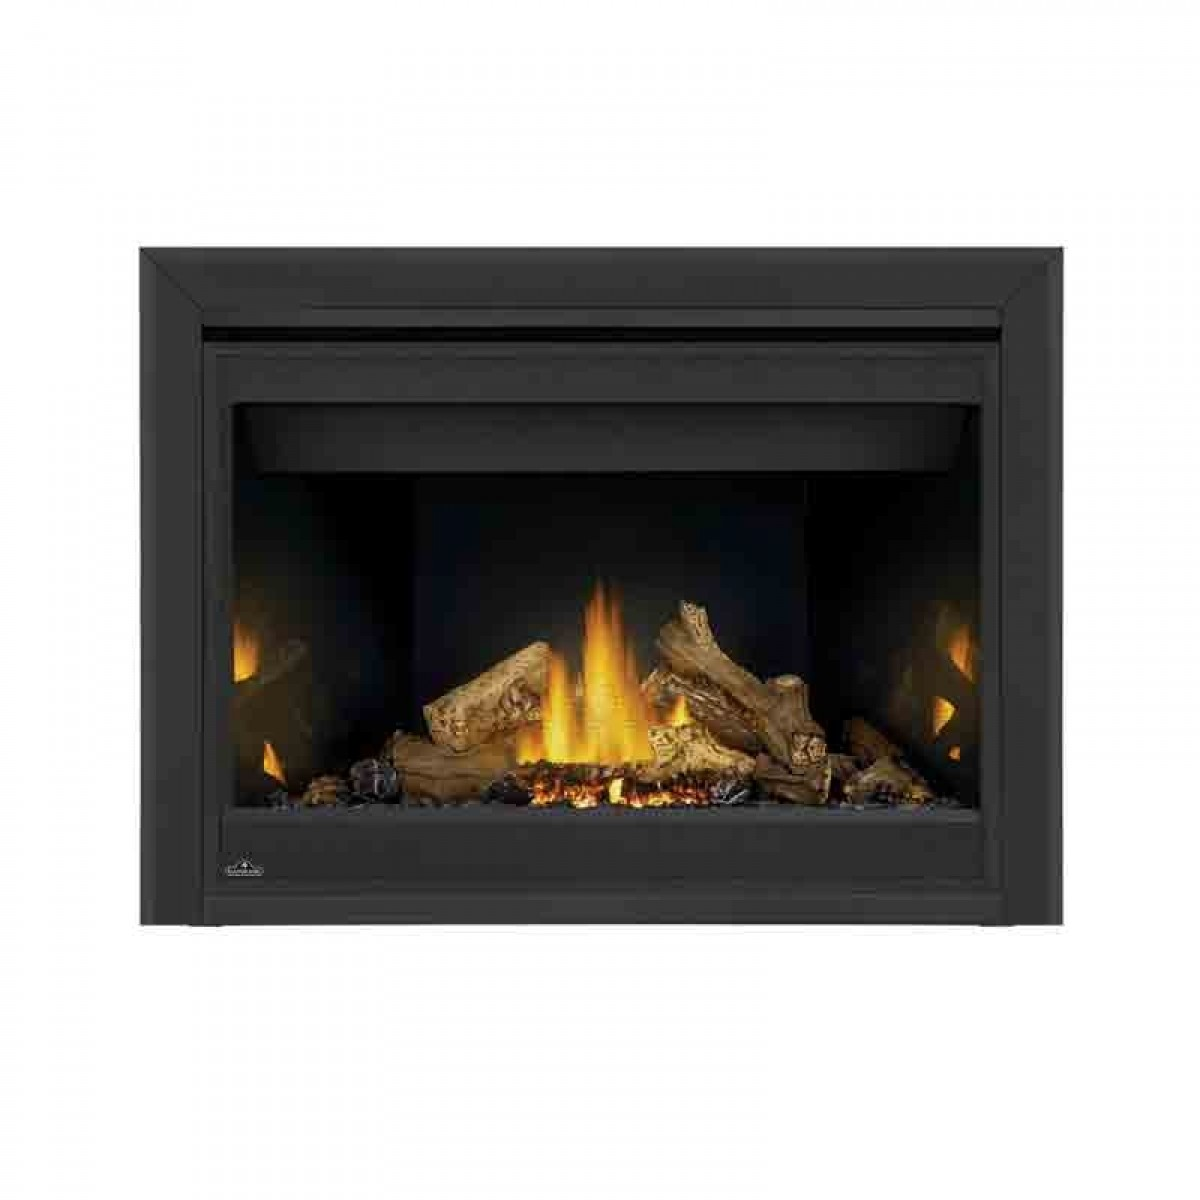 Fireplace Natural Gas Conversion Kit